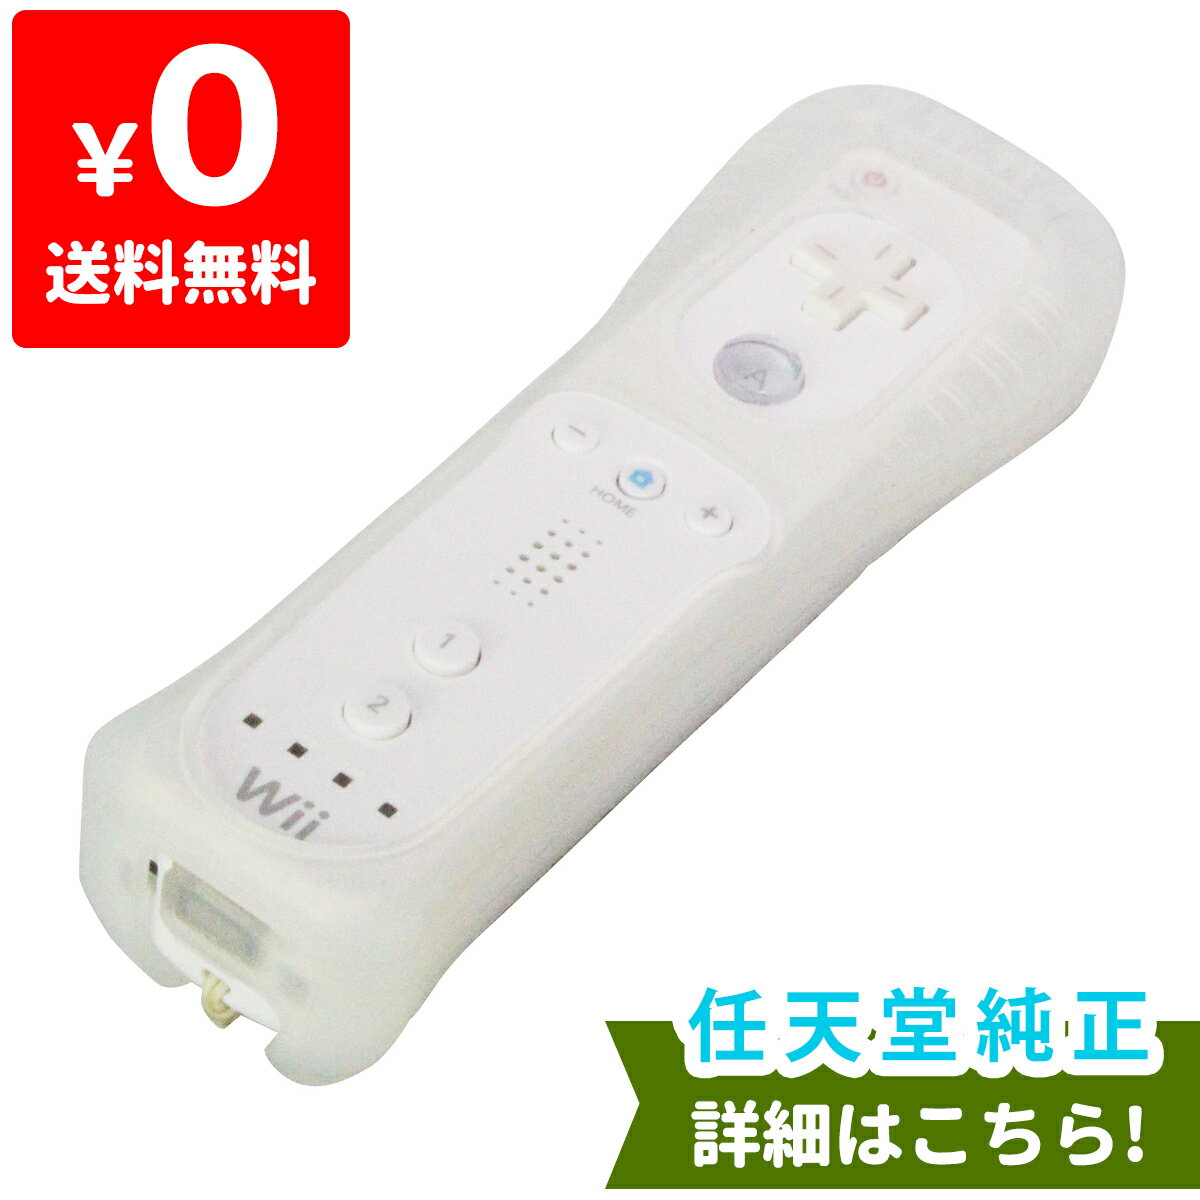 Wii ニンテンドーWii Wiiリモコン (シロ) (「Wiiリモコンジャケット」同梱) 周辺機器 Nintendo 任天堂 ニンテンドー 中古 4902370516241 送料無料